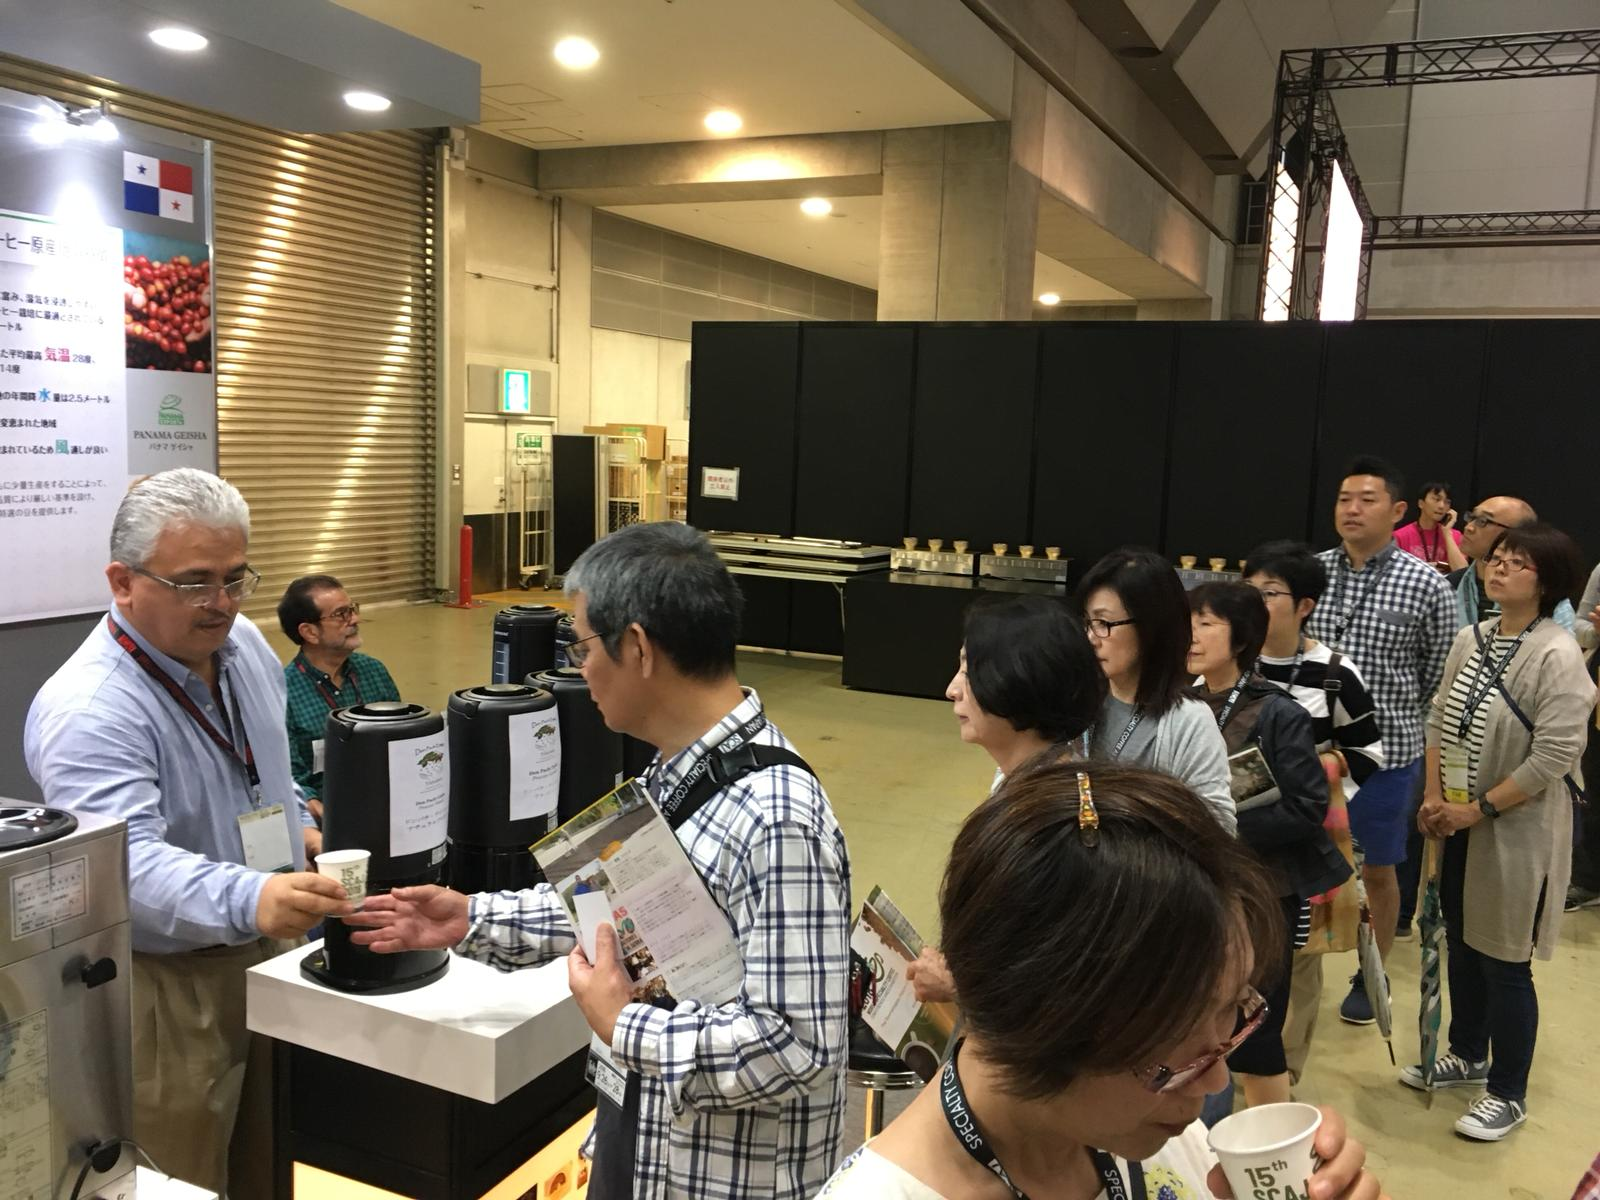 (SCAJ2018の様子)ゲイシャコーヒー 試飲のために列を成す参加者